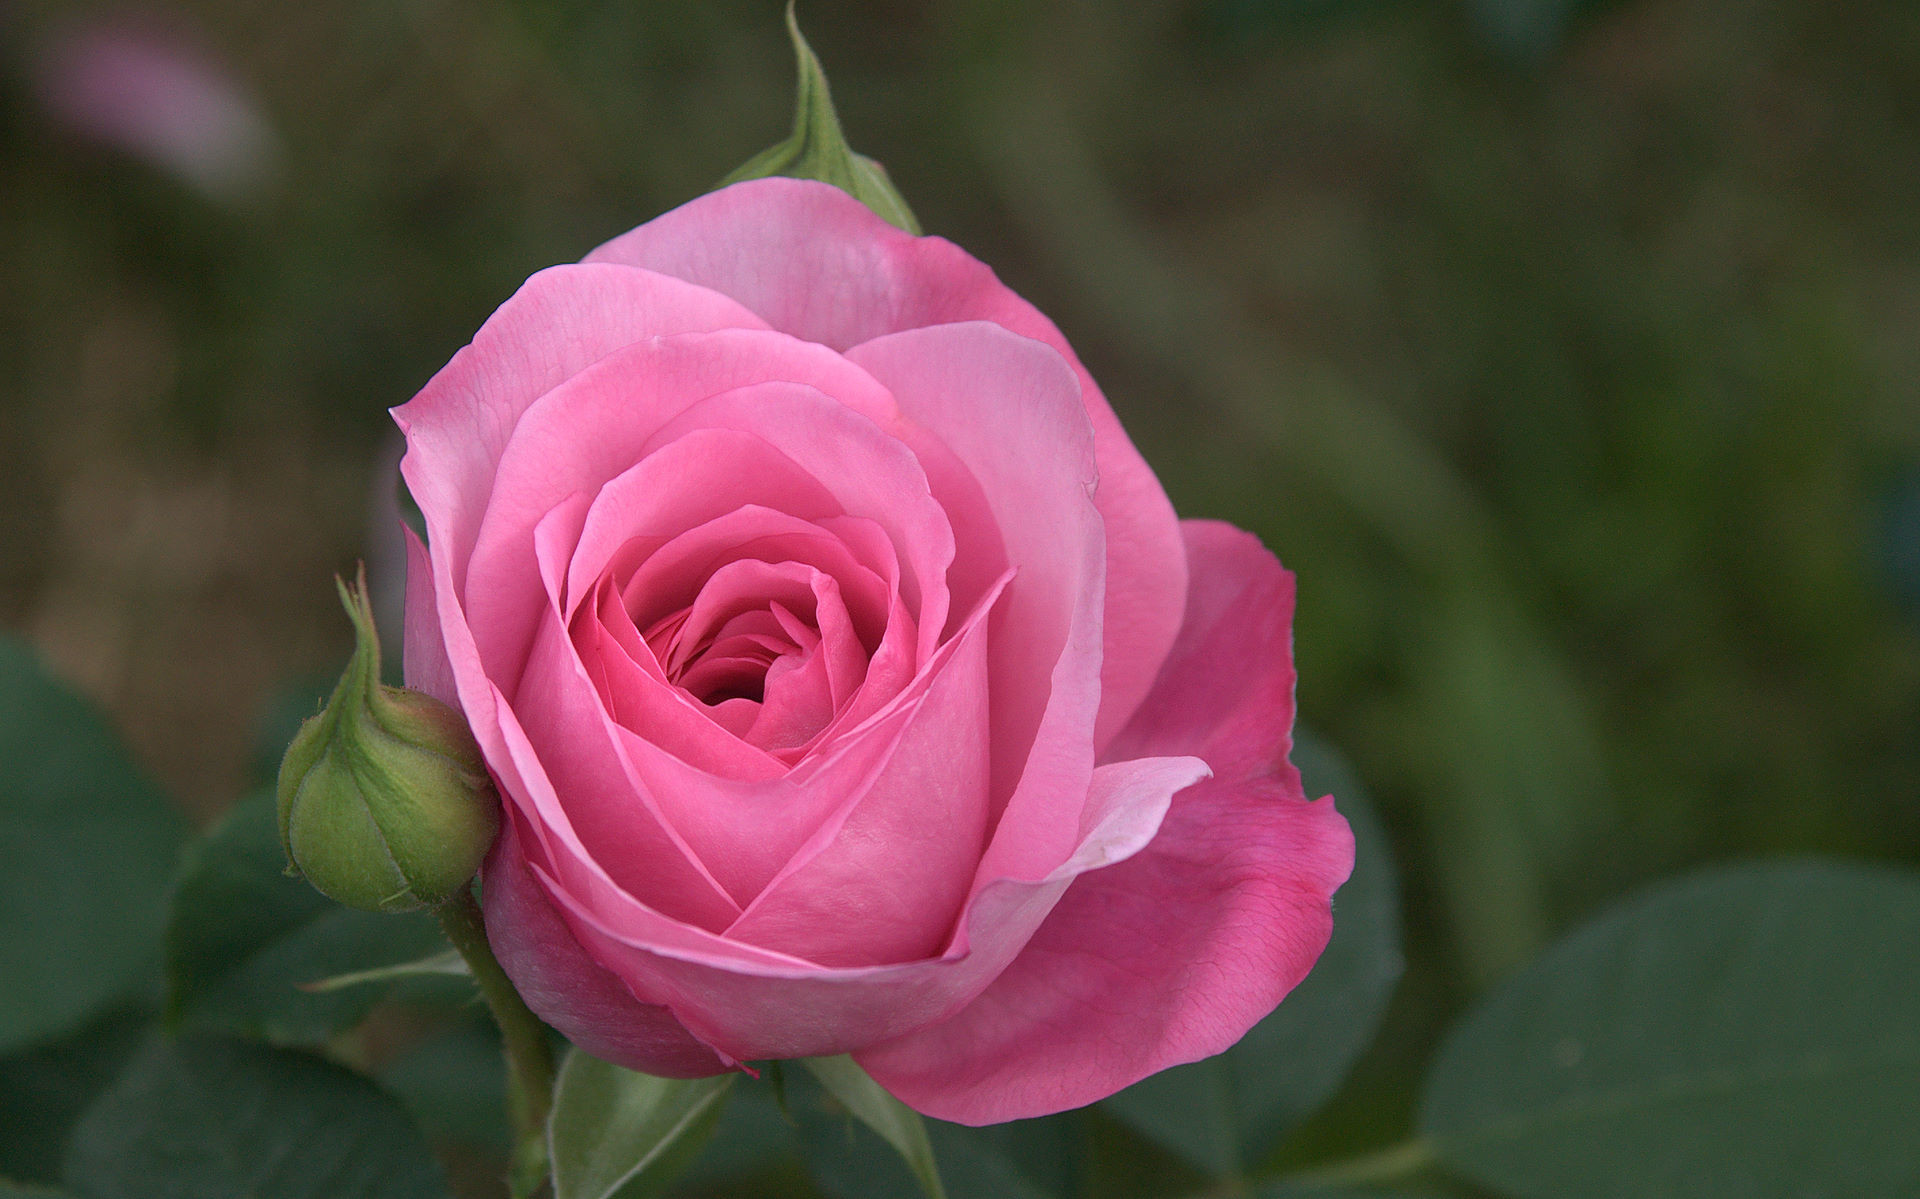 rose lembayung muda foto gratis di pixabay foto cantik